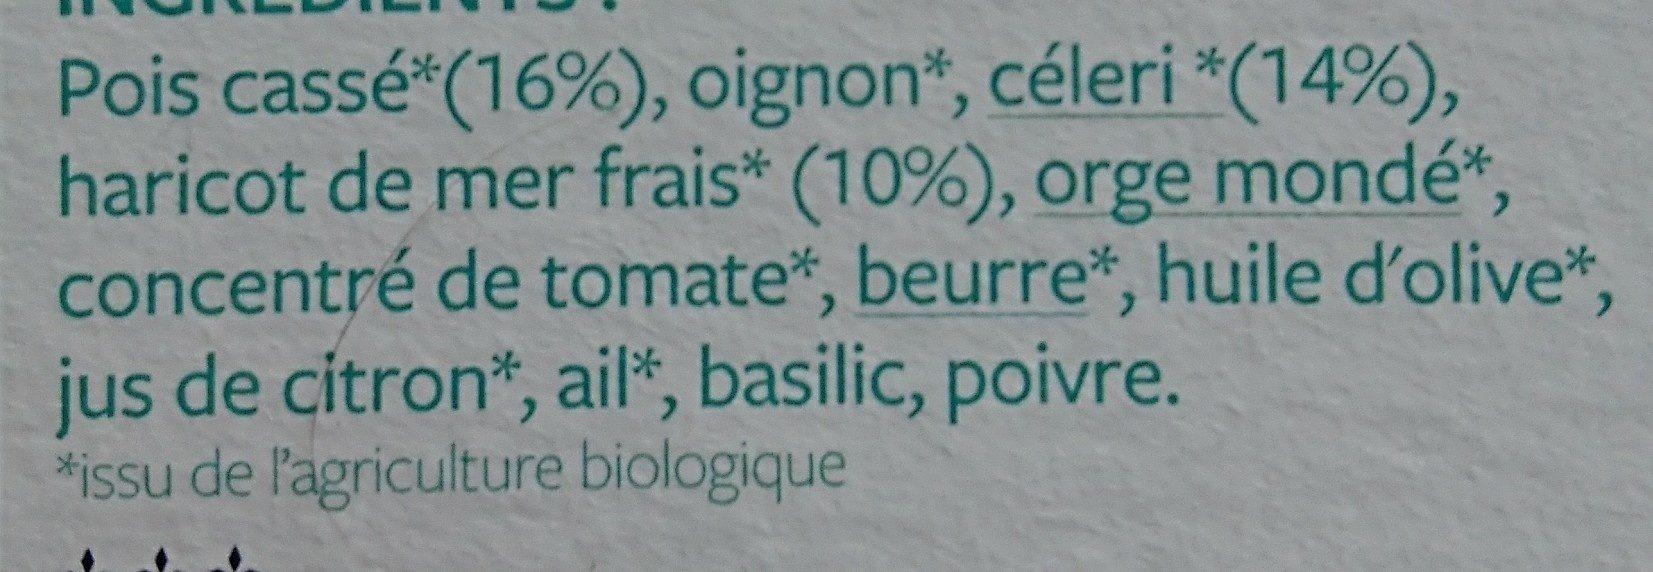 Poêlée Pois cassé, céleri et Haricot de mer - Ingrediënten - fr